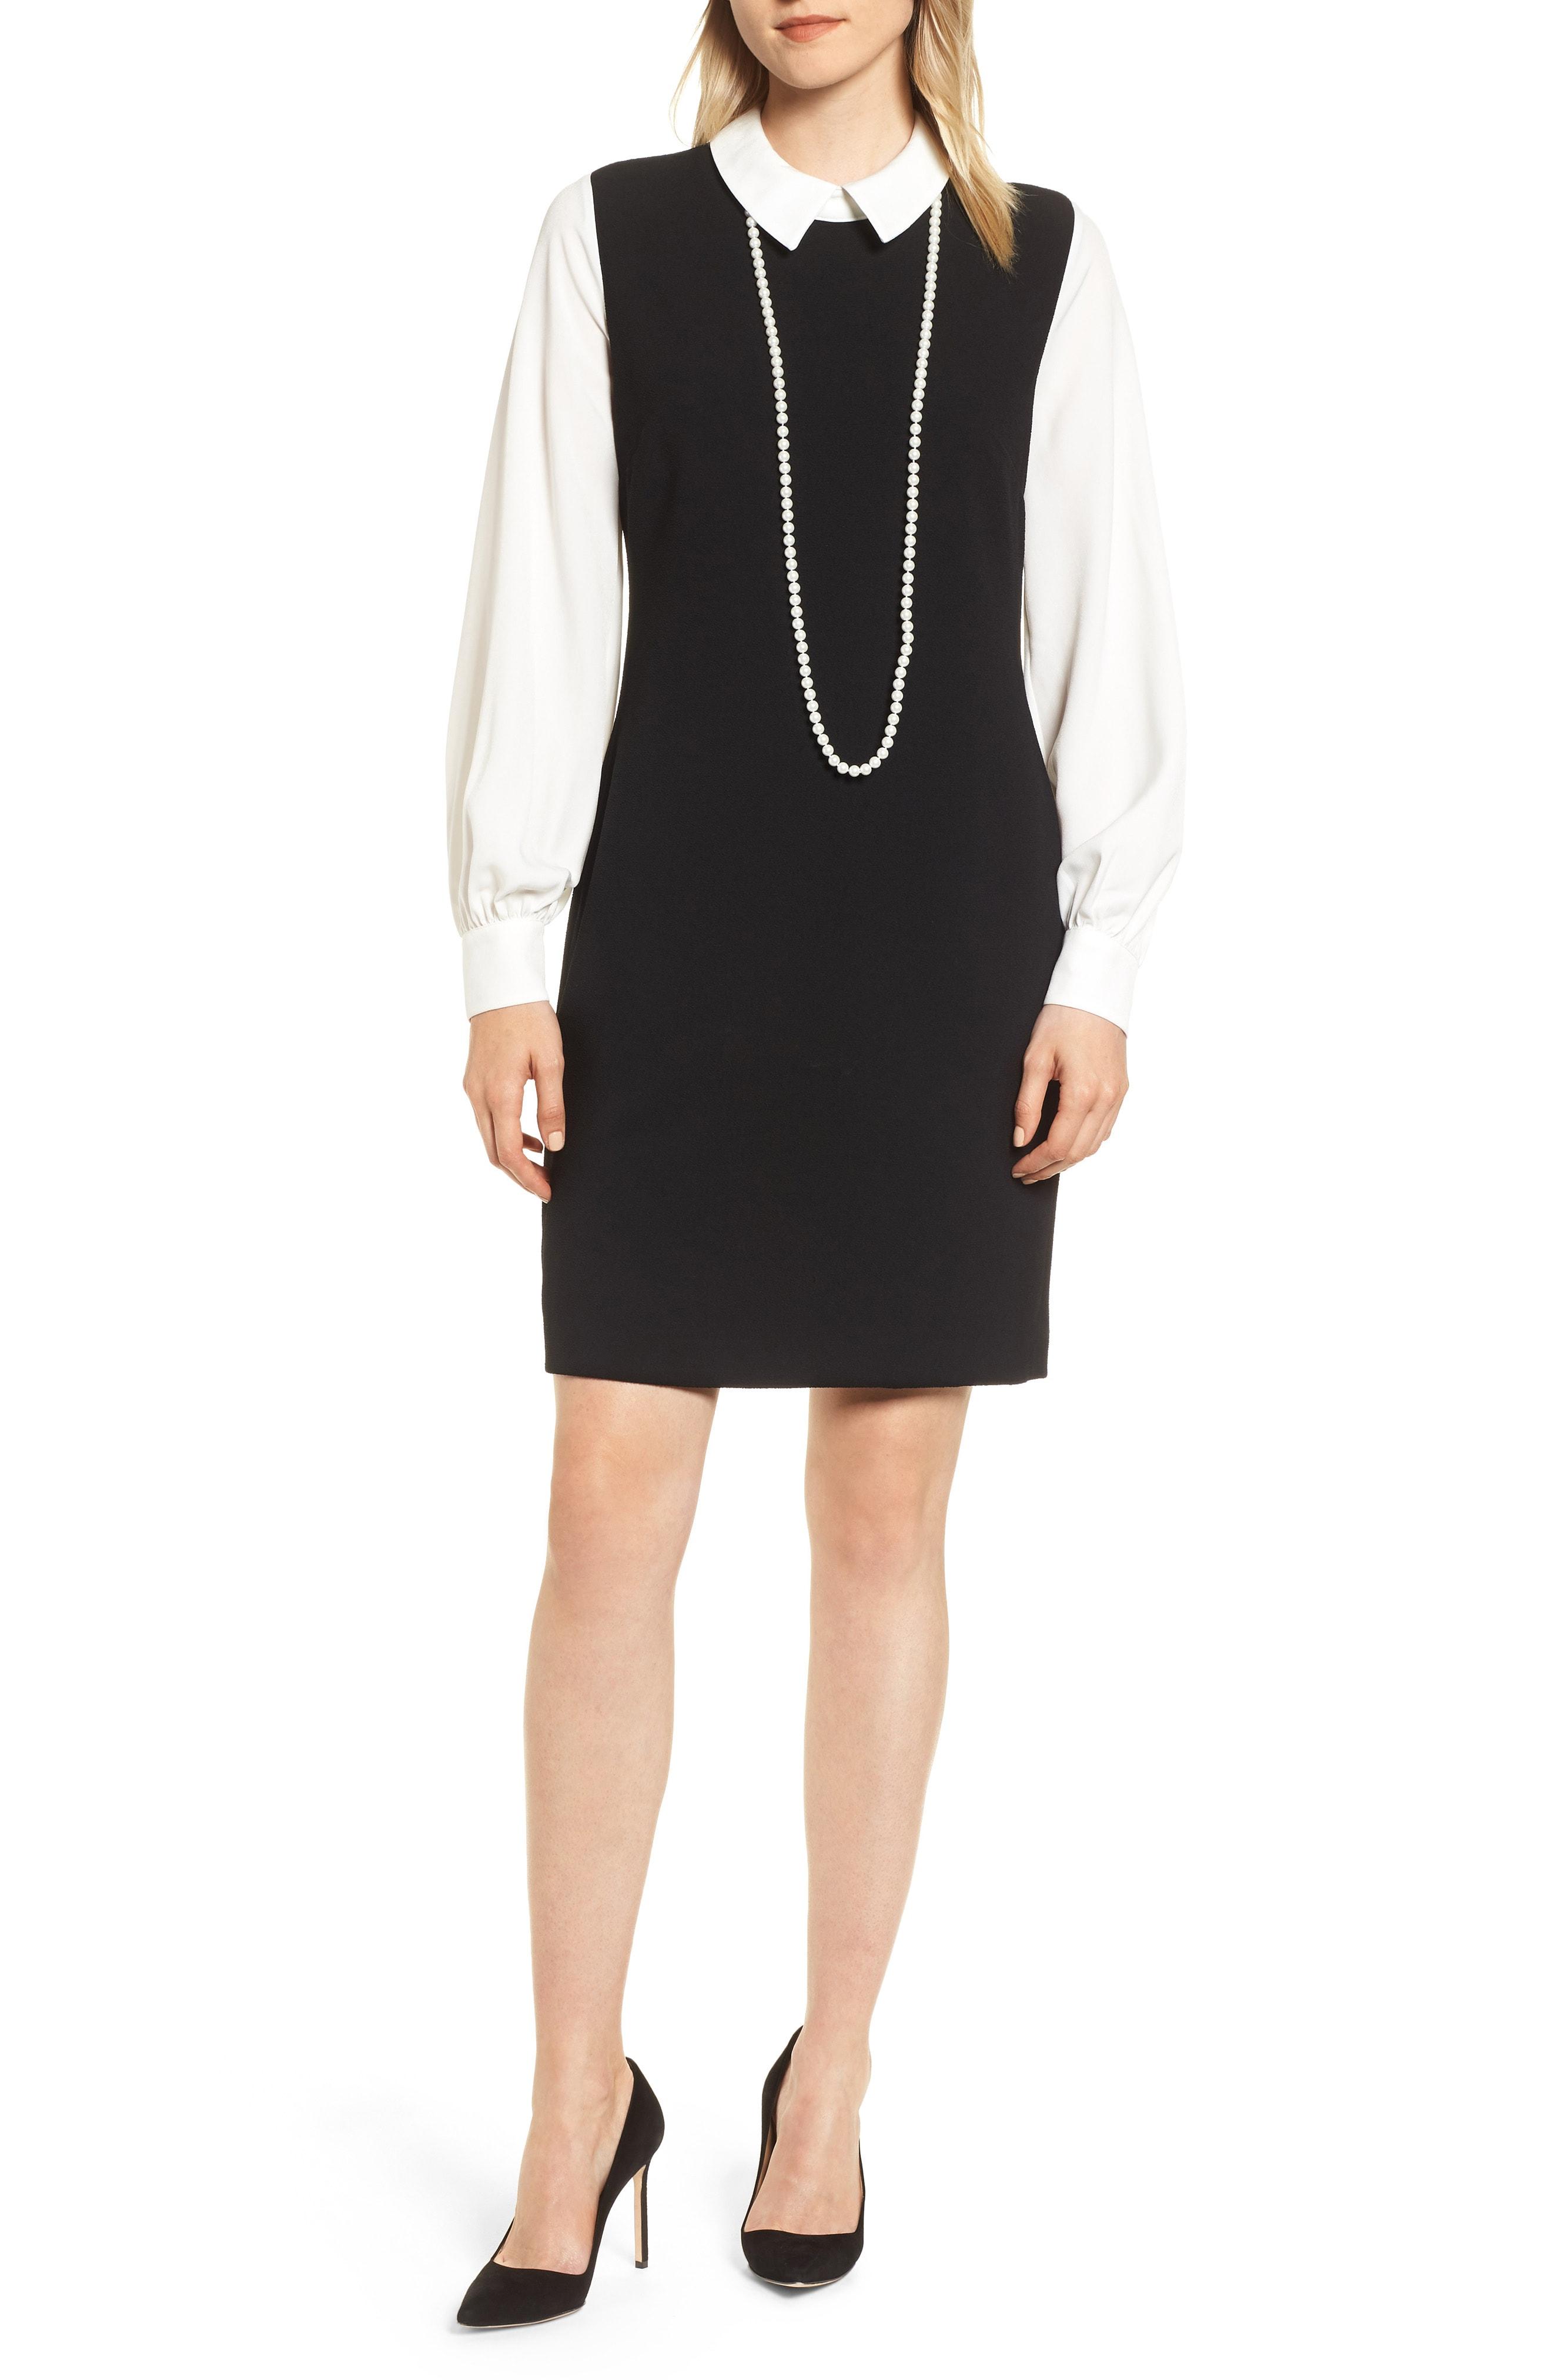 KARL LAGERFELD PARIS String of Faux Pearls Dress